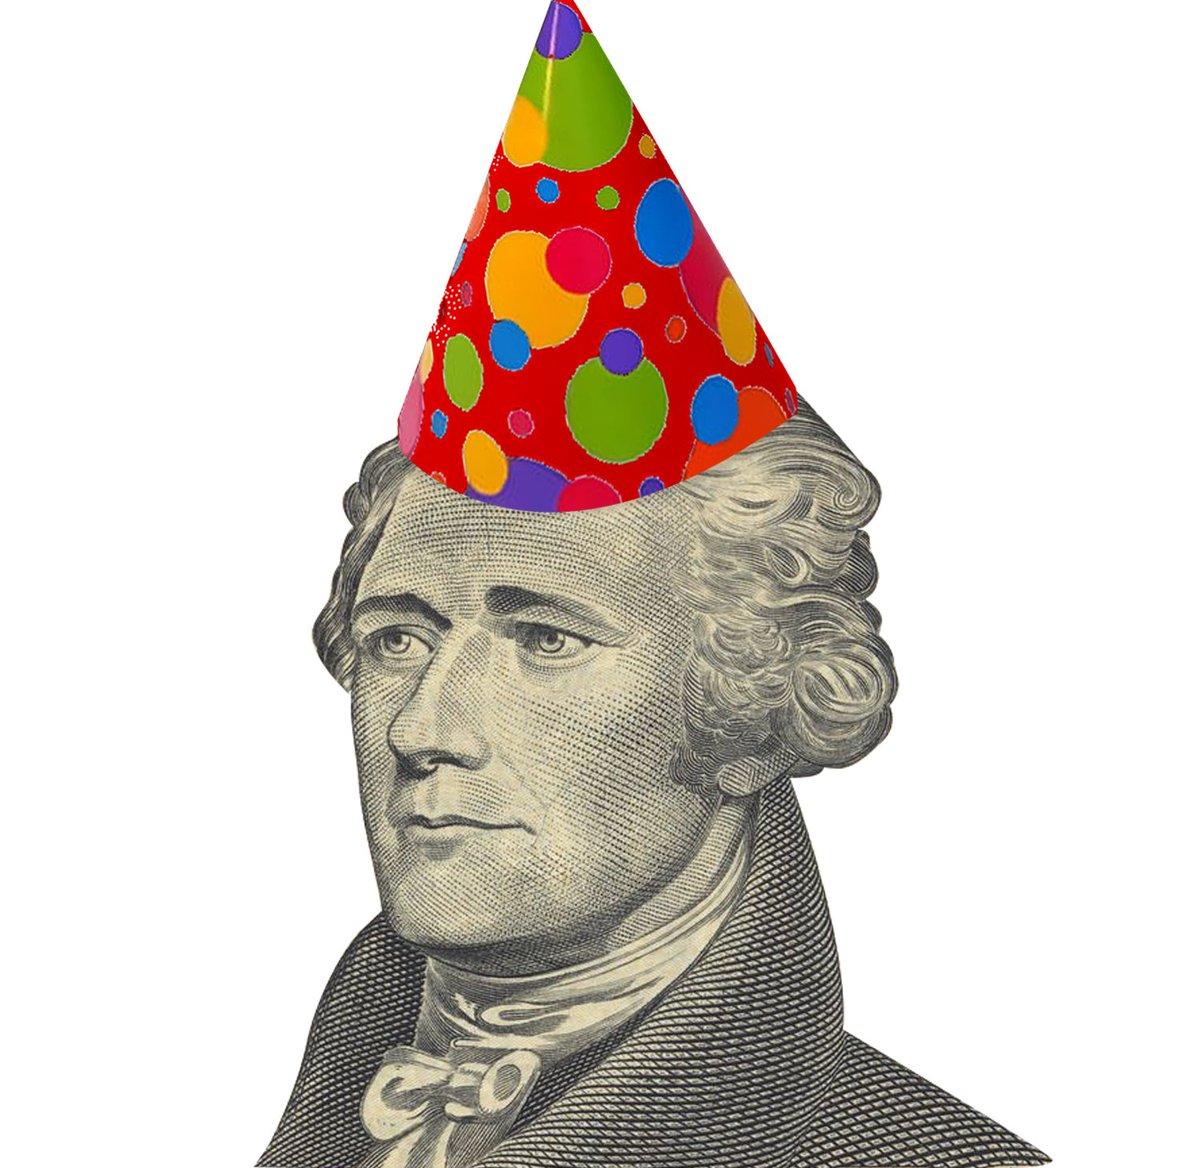 "Alexander Hamilton On Twitter: ""Happy Birthday Alexander"